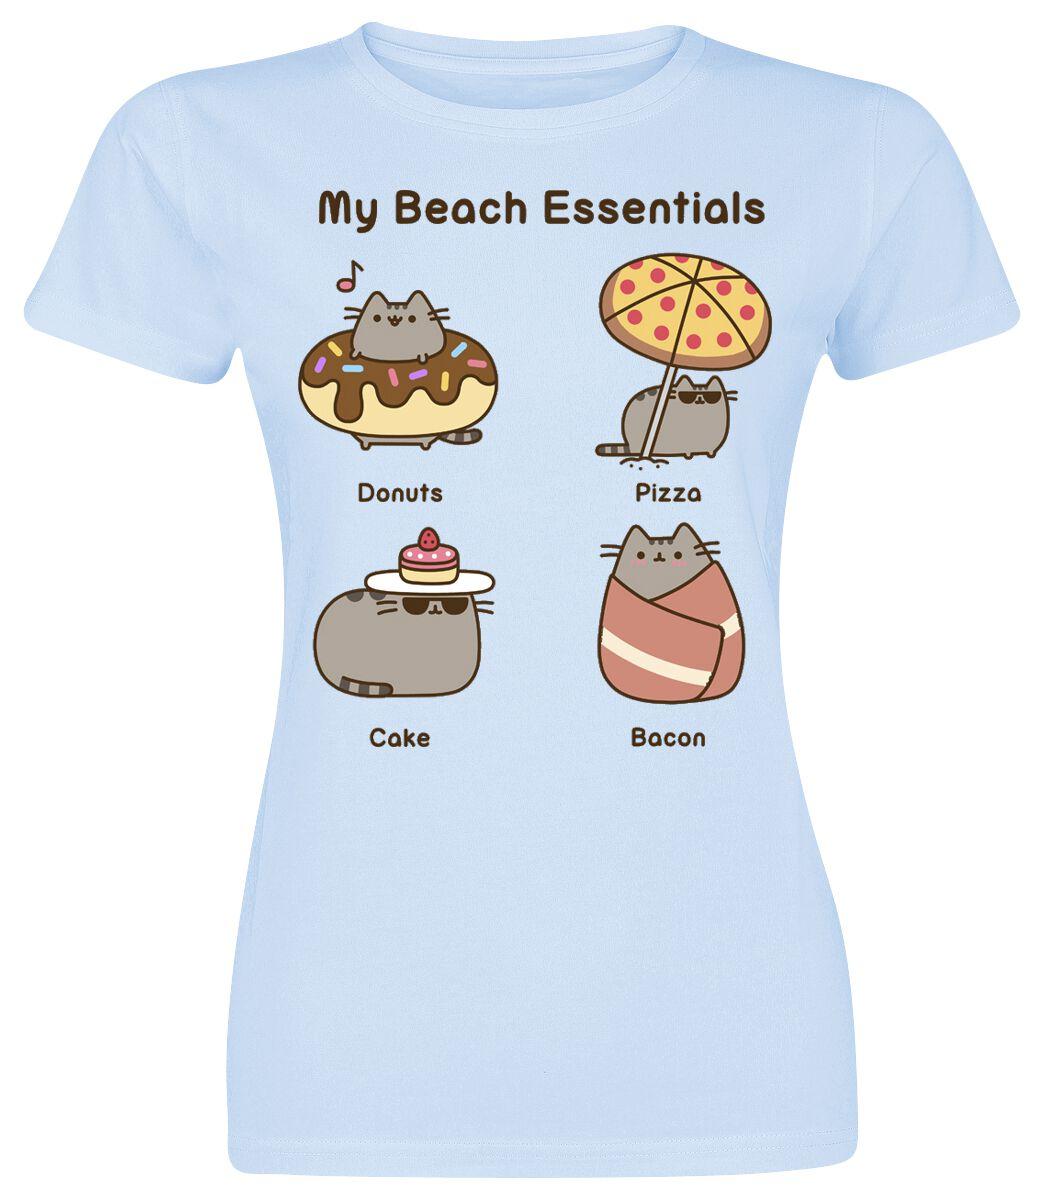 Merch dla Fanów - Koszulki - Koszulka damska Pusheen Beach Essential Koszulka damska jasnoniebieski - 345140